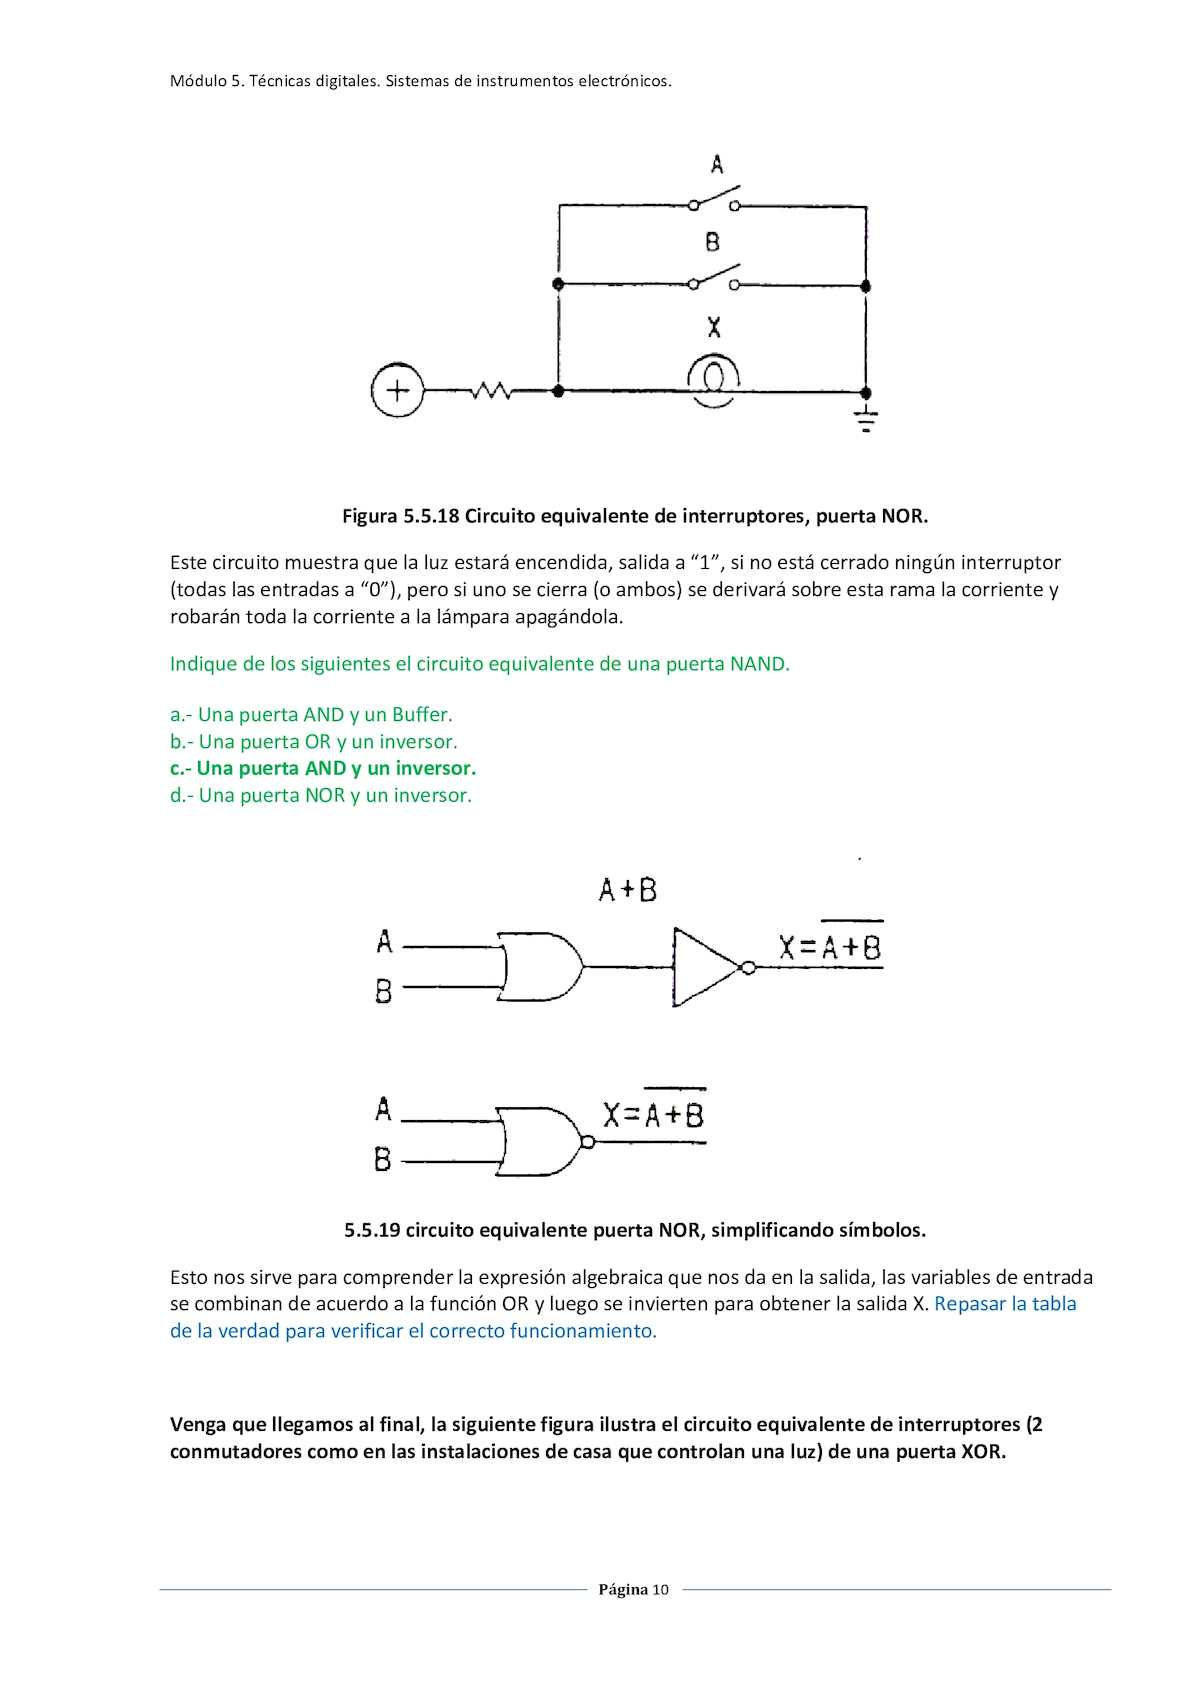 Circuito And : Circuitos logicos calameo downloader